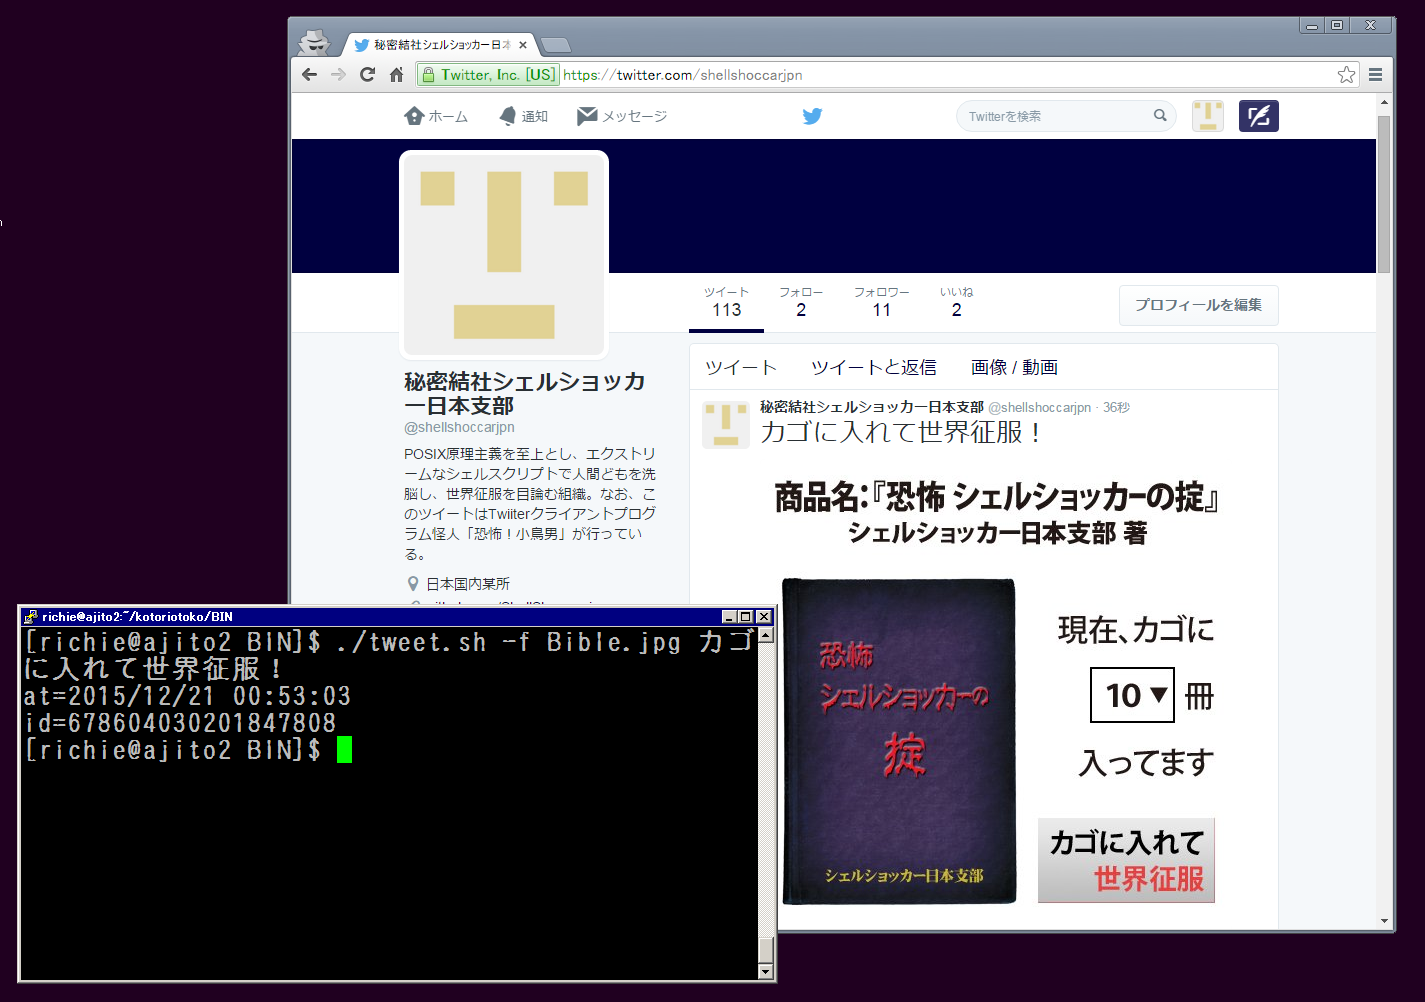 Kotoriotoko_ScreenShot.png